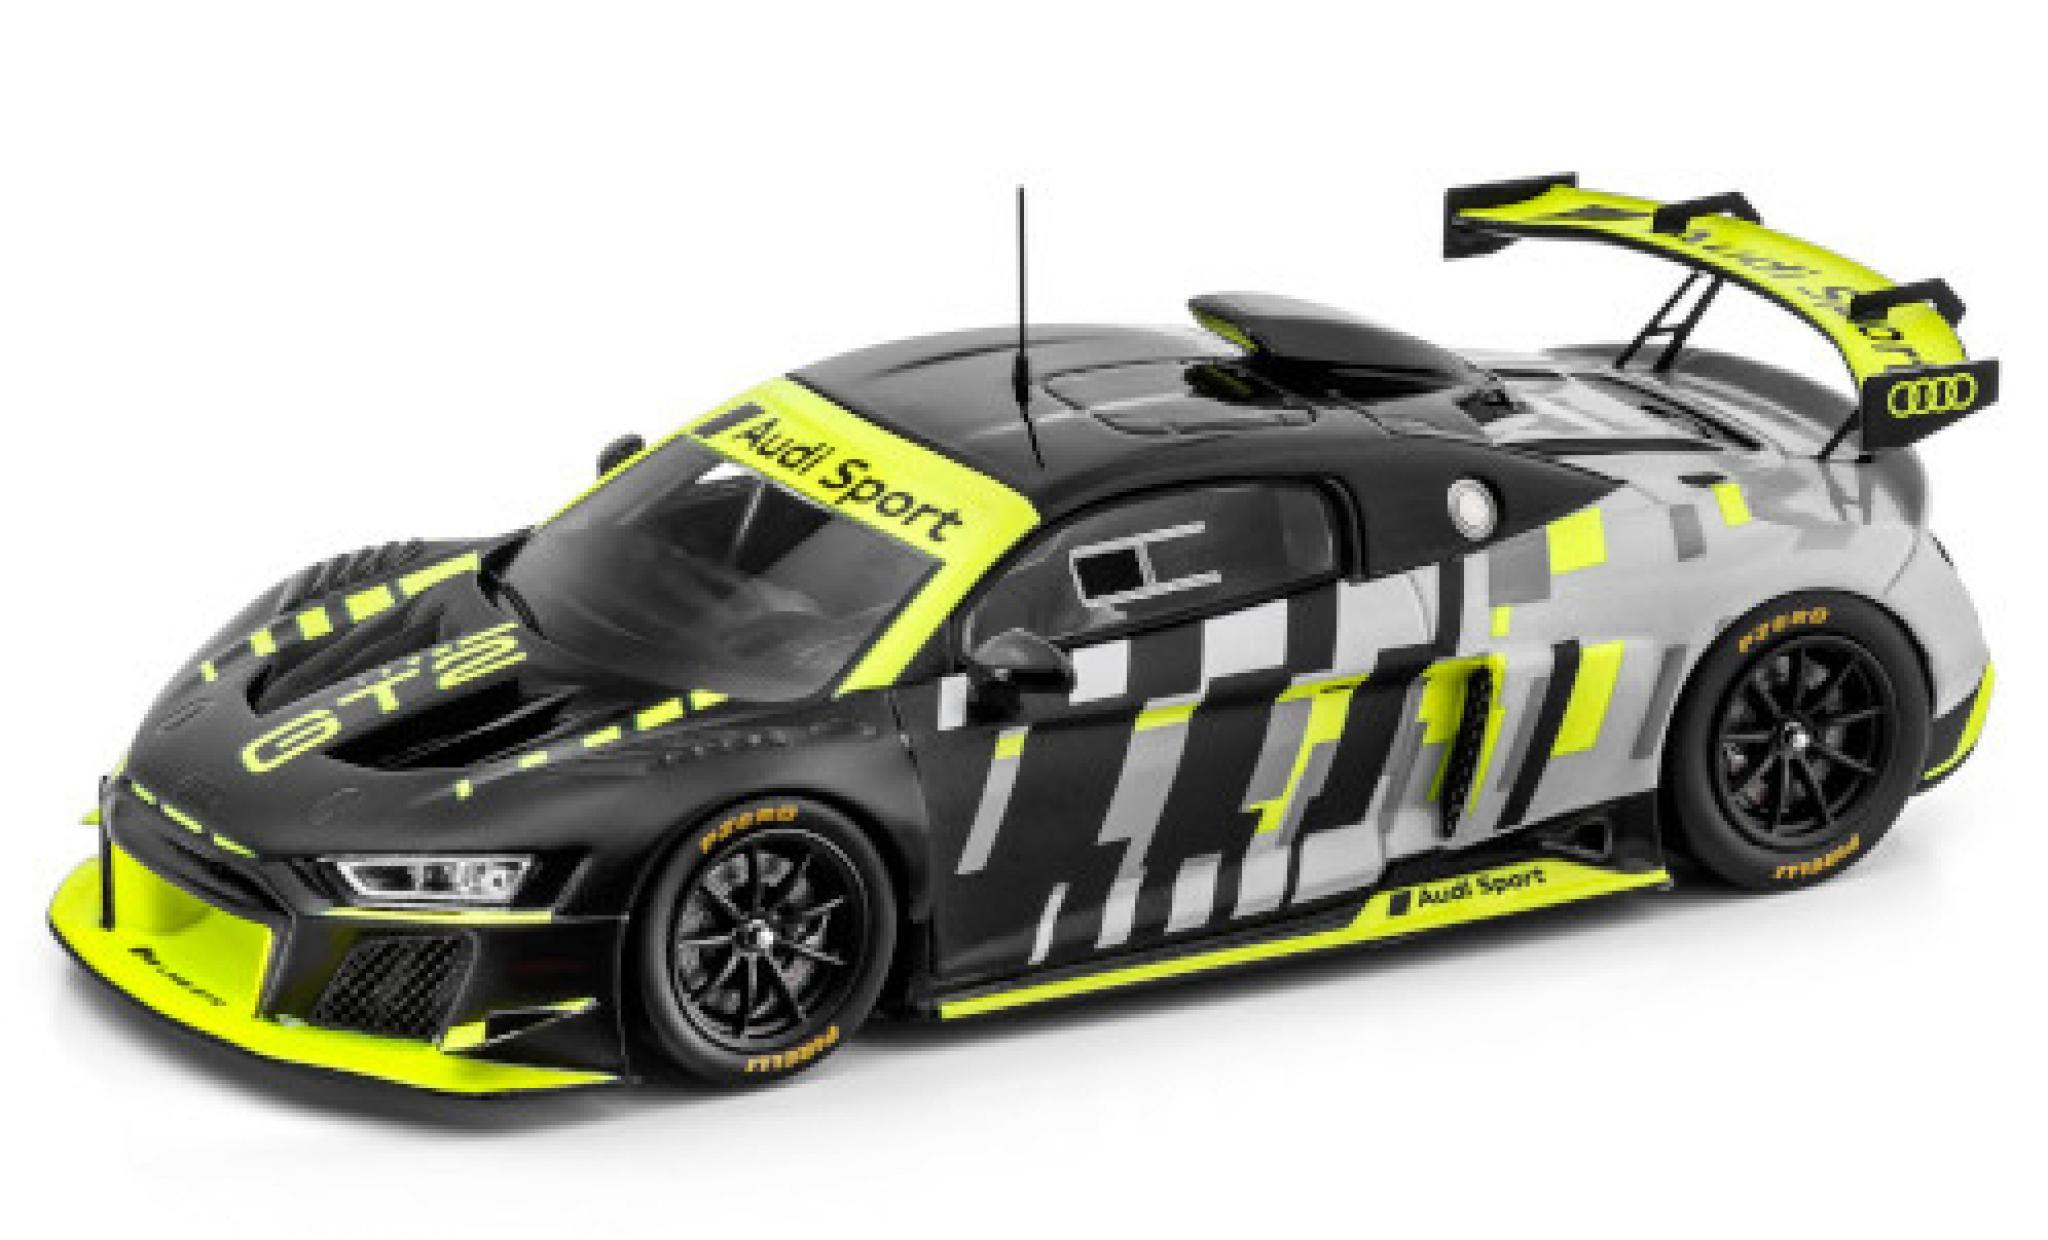 Audi R8 1/43 I Spark LMS GT2 matt-black/metallise grey Sport véhicule de présentation